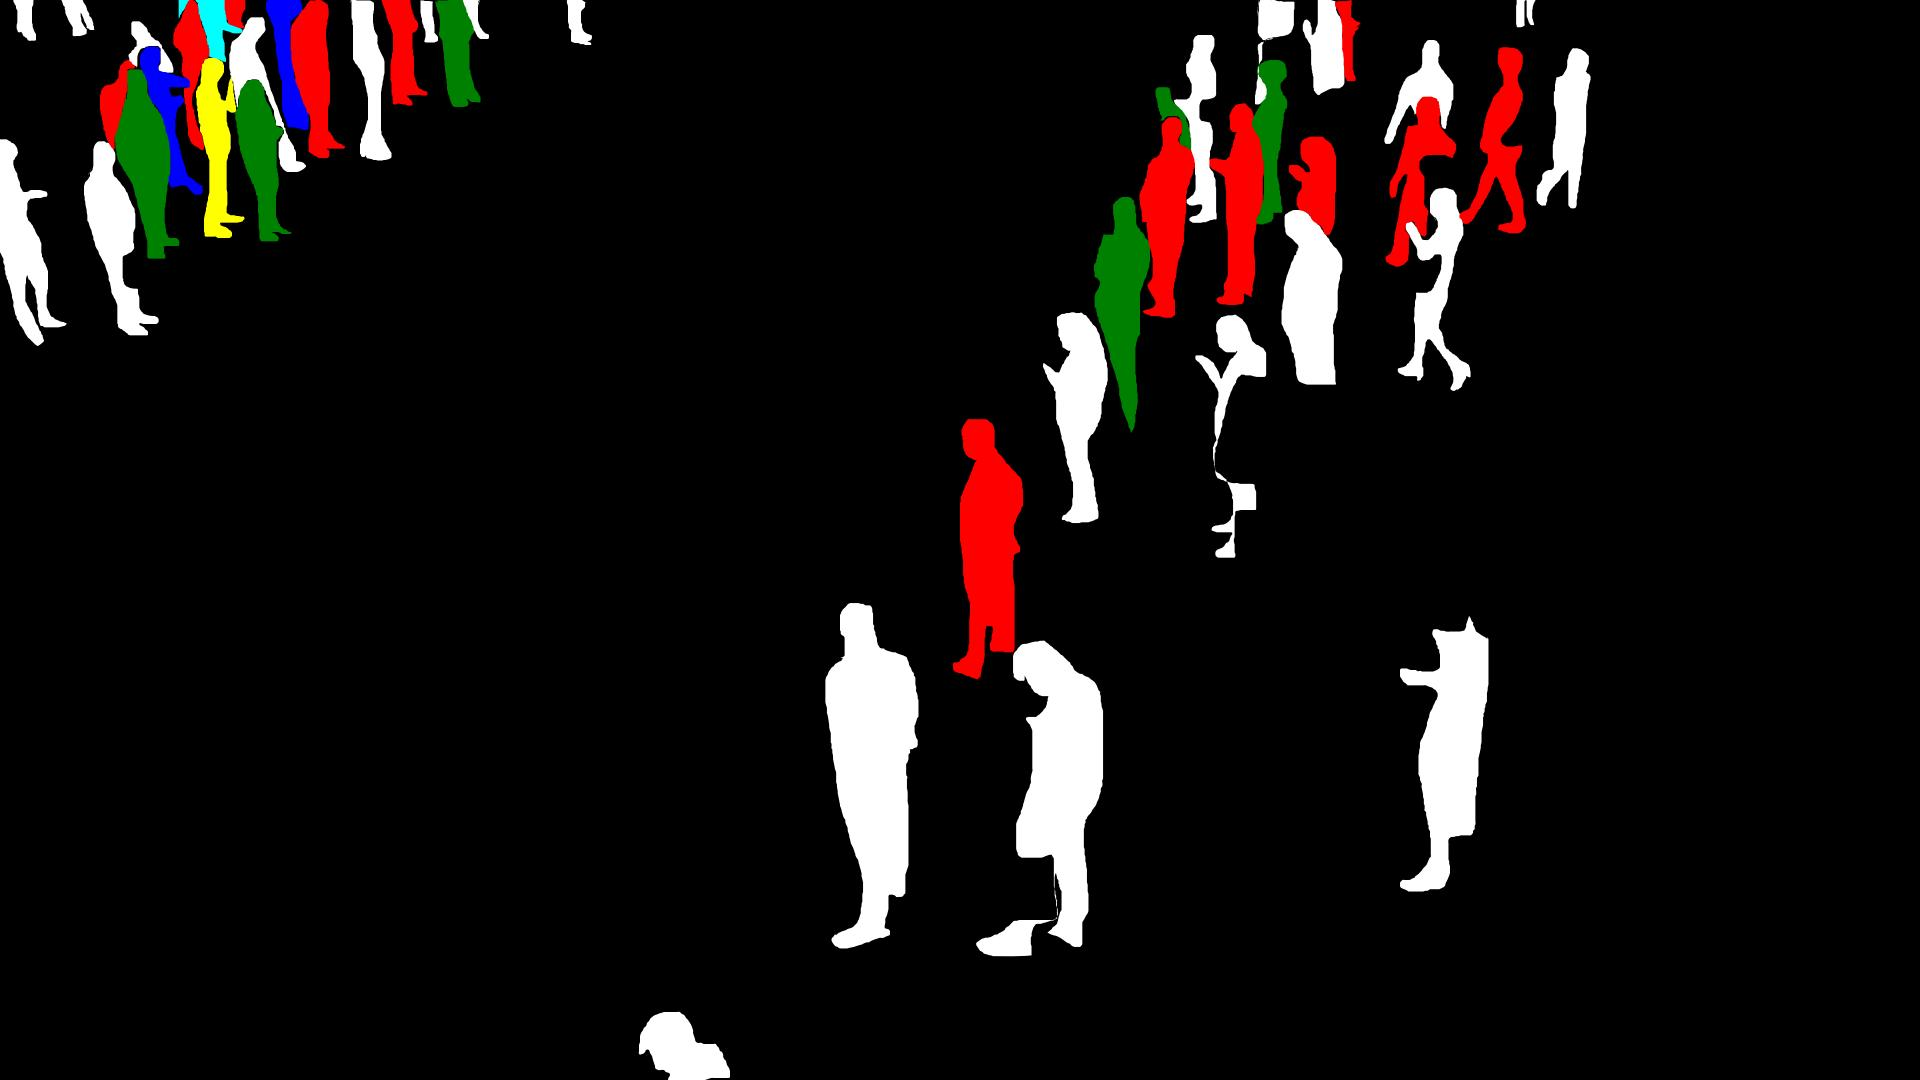 117 Videos-Subway & Street Surveillance Video Data_15,621 Images Annotation Data_Intelligent Security Data Solution_Datatang